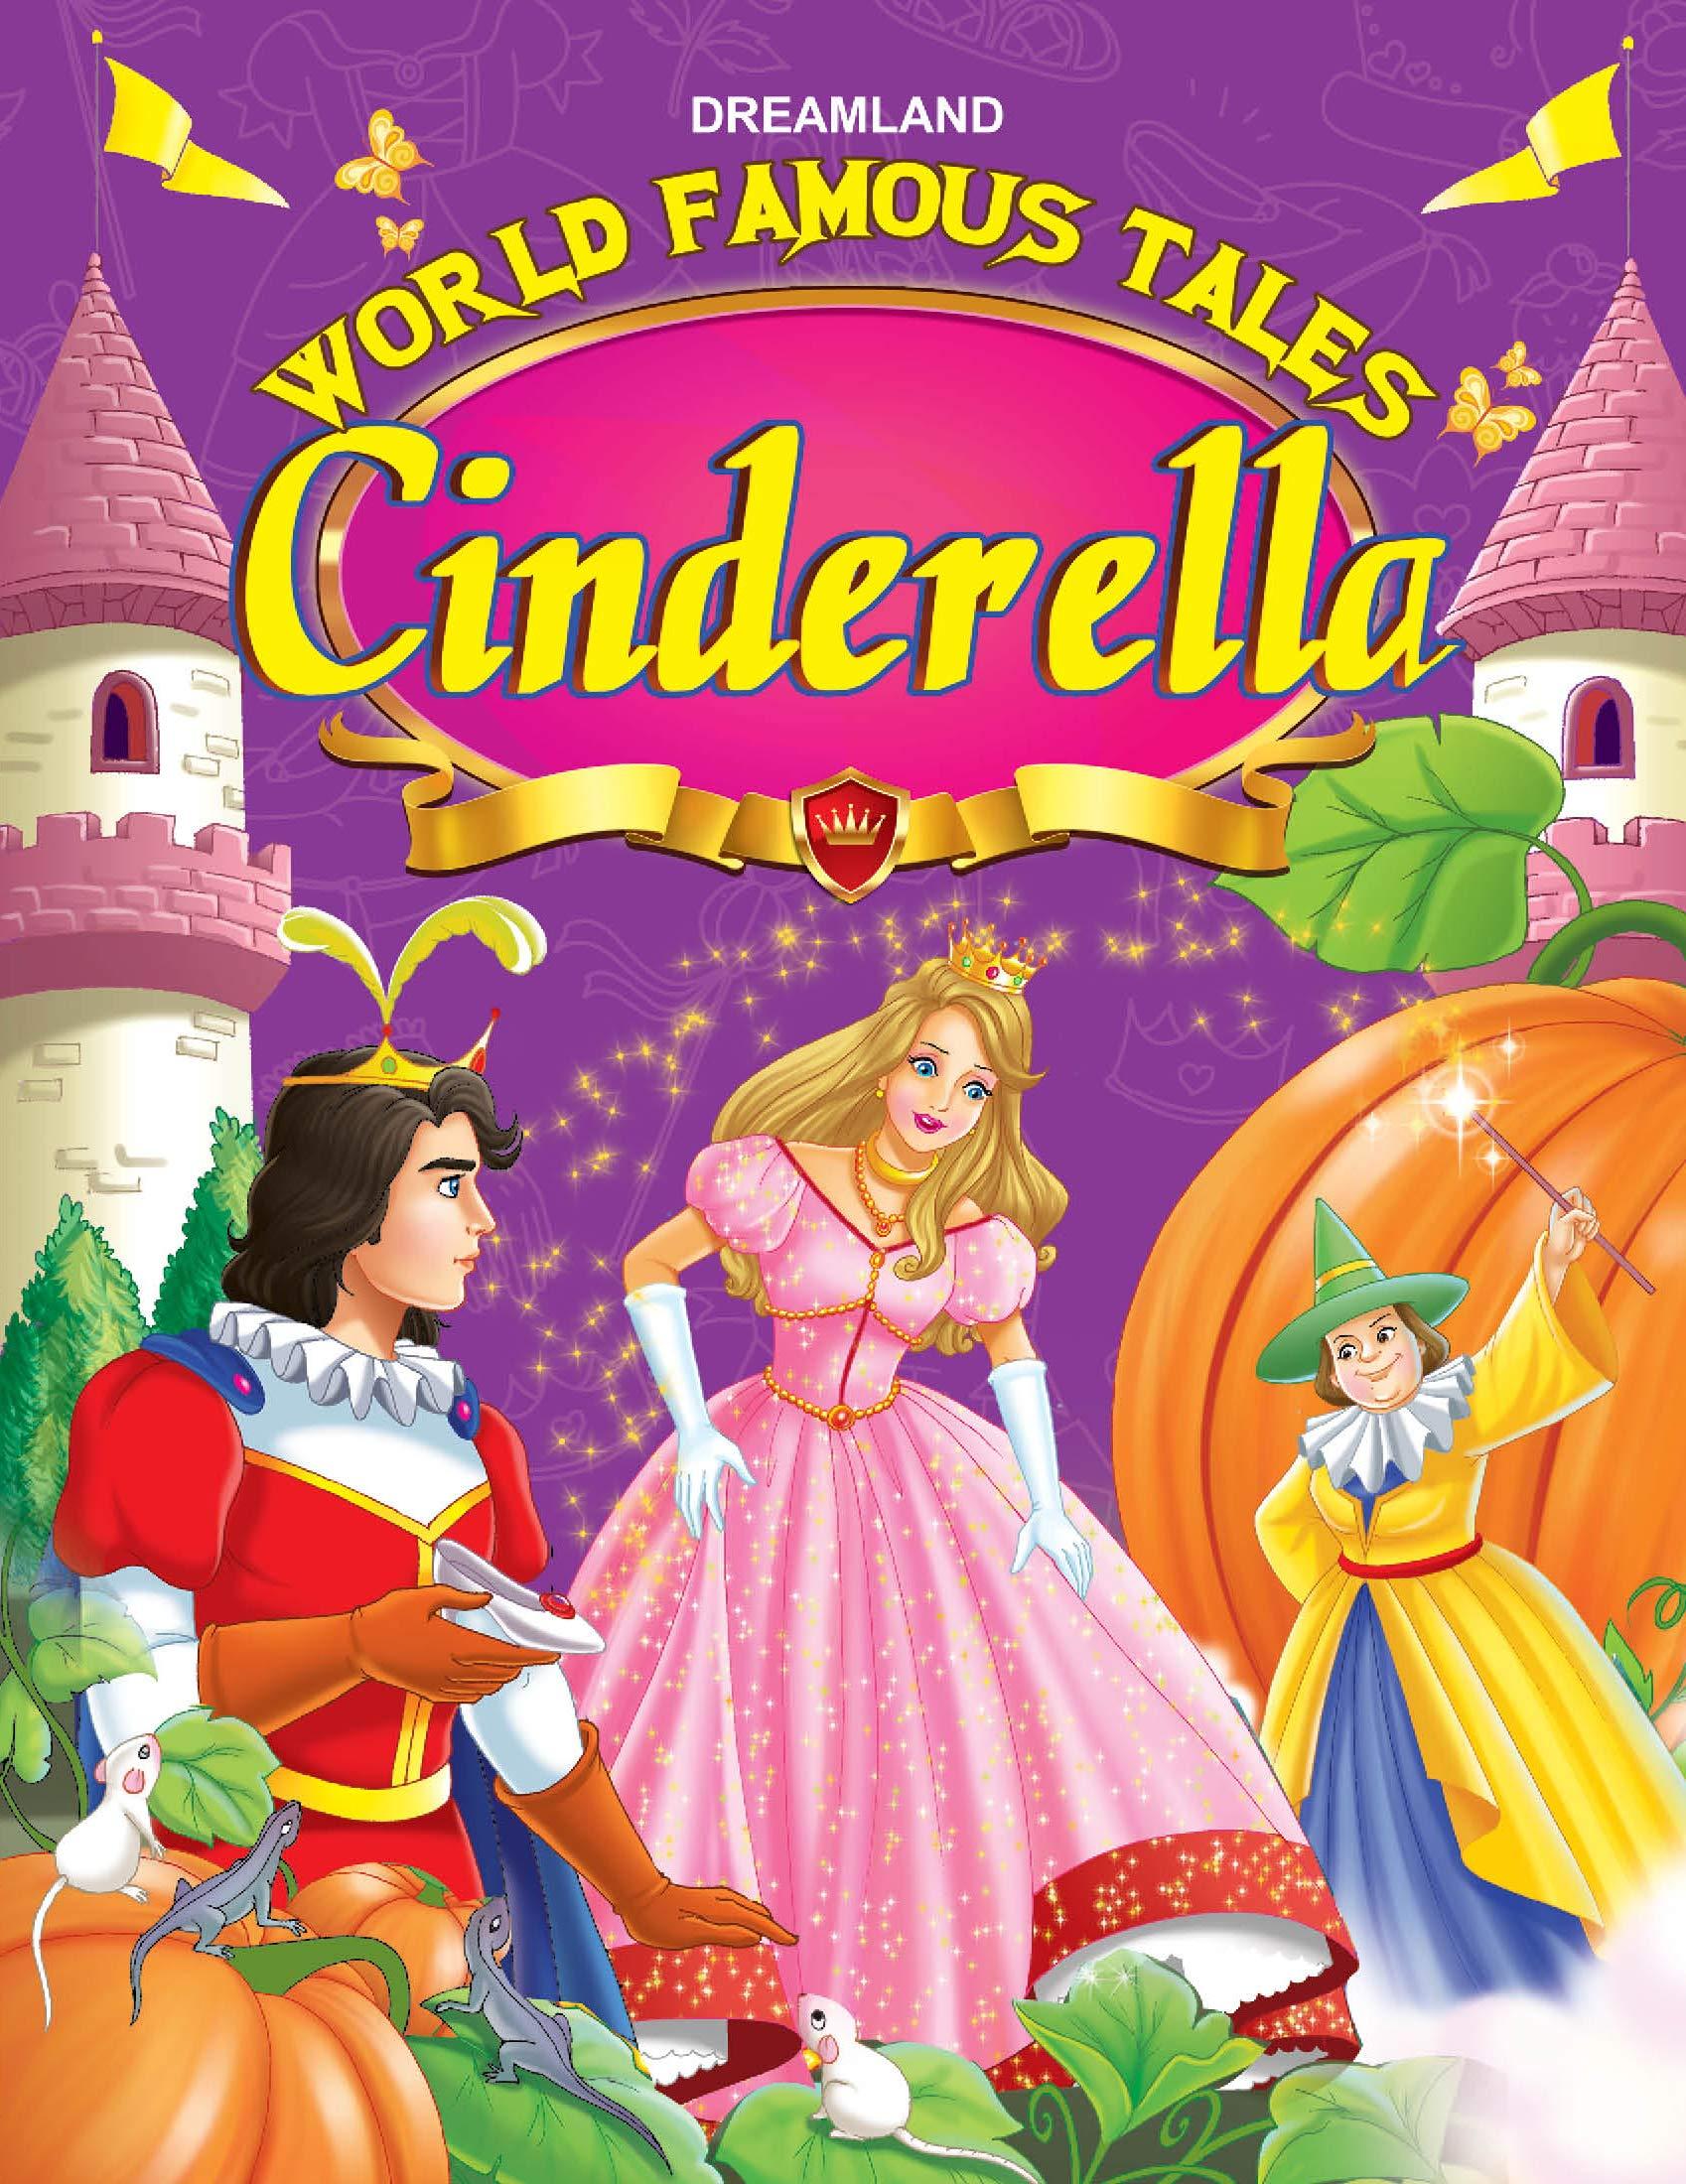 World Famous Tales - Cinderella